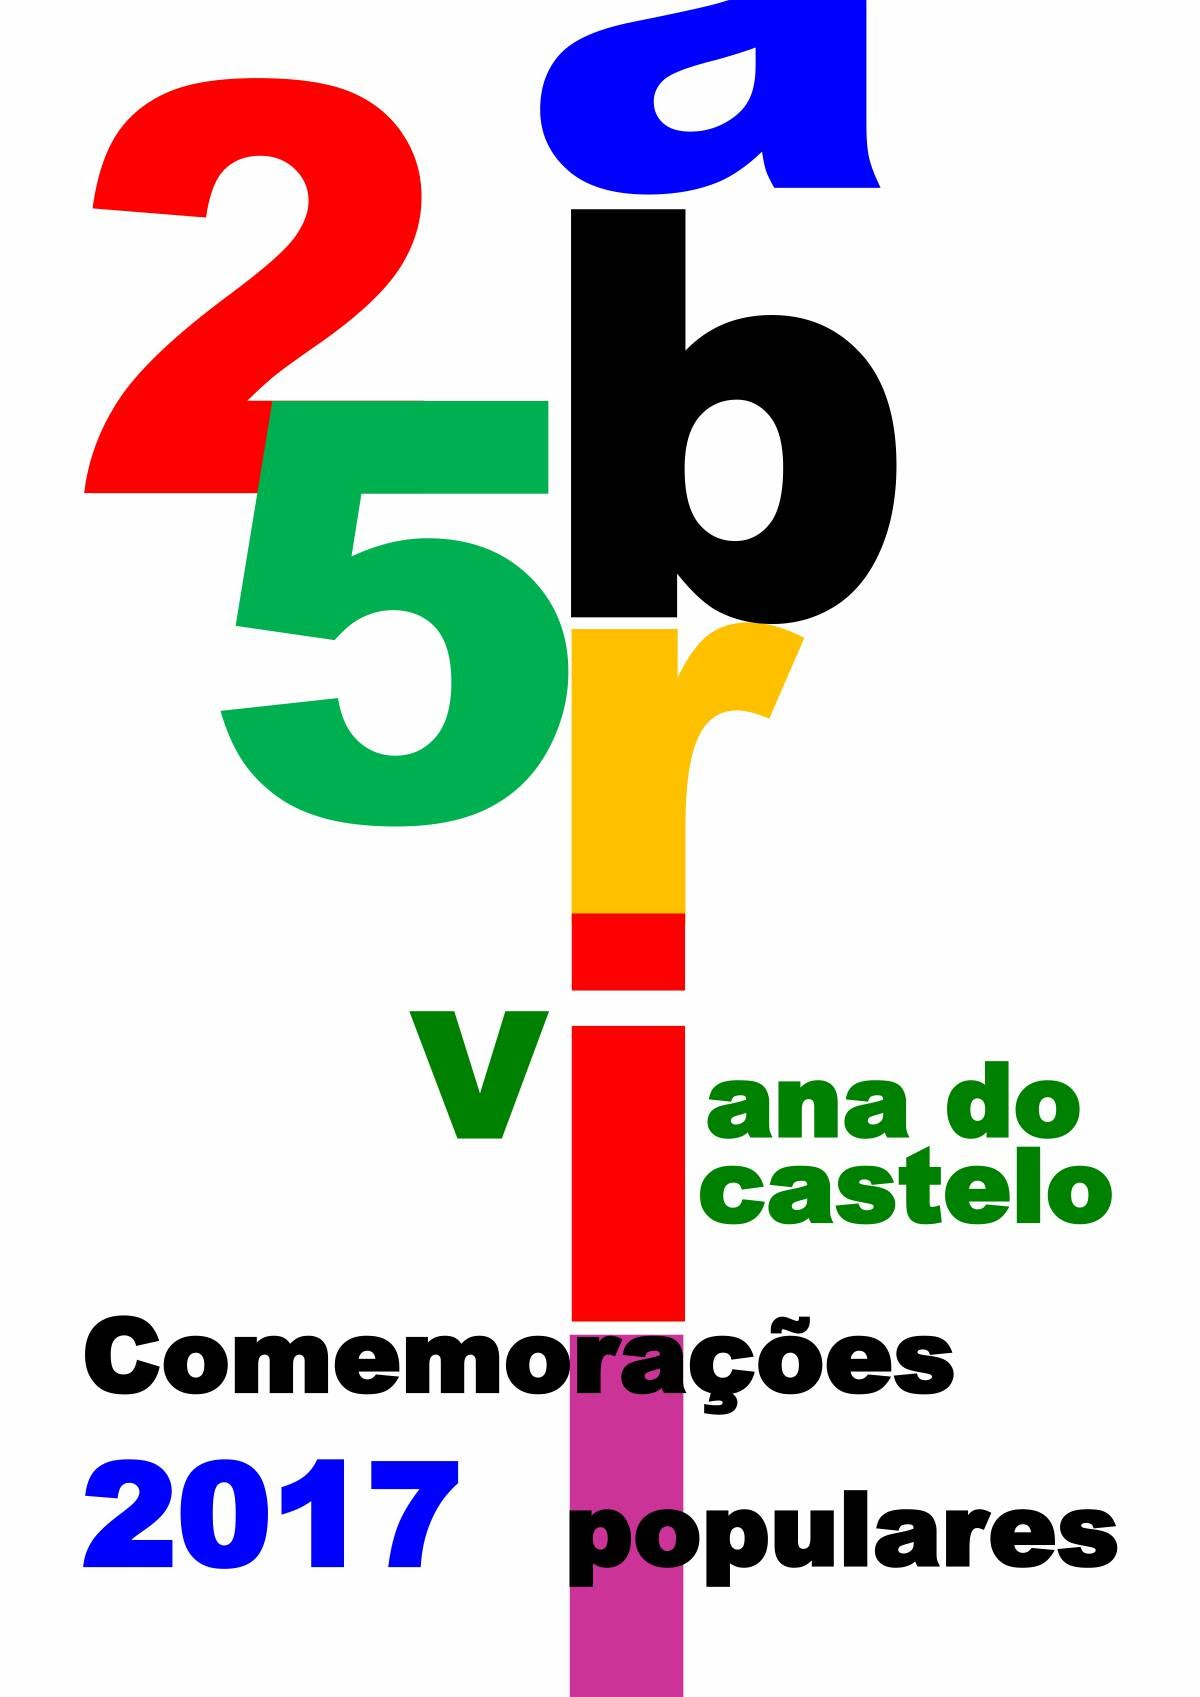 https://sites.google.com/a/centroculturaldoaltominho.org/ccam/actividades-realizadas/2017/realizacoes-actividades/comemoracoes25deabril